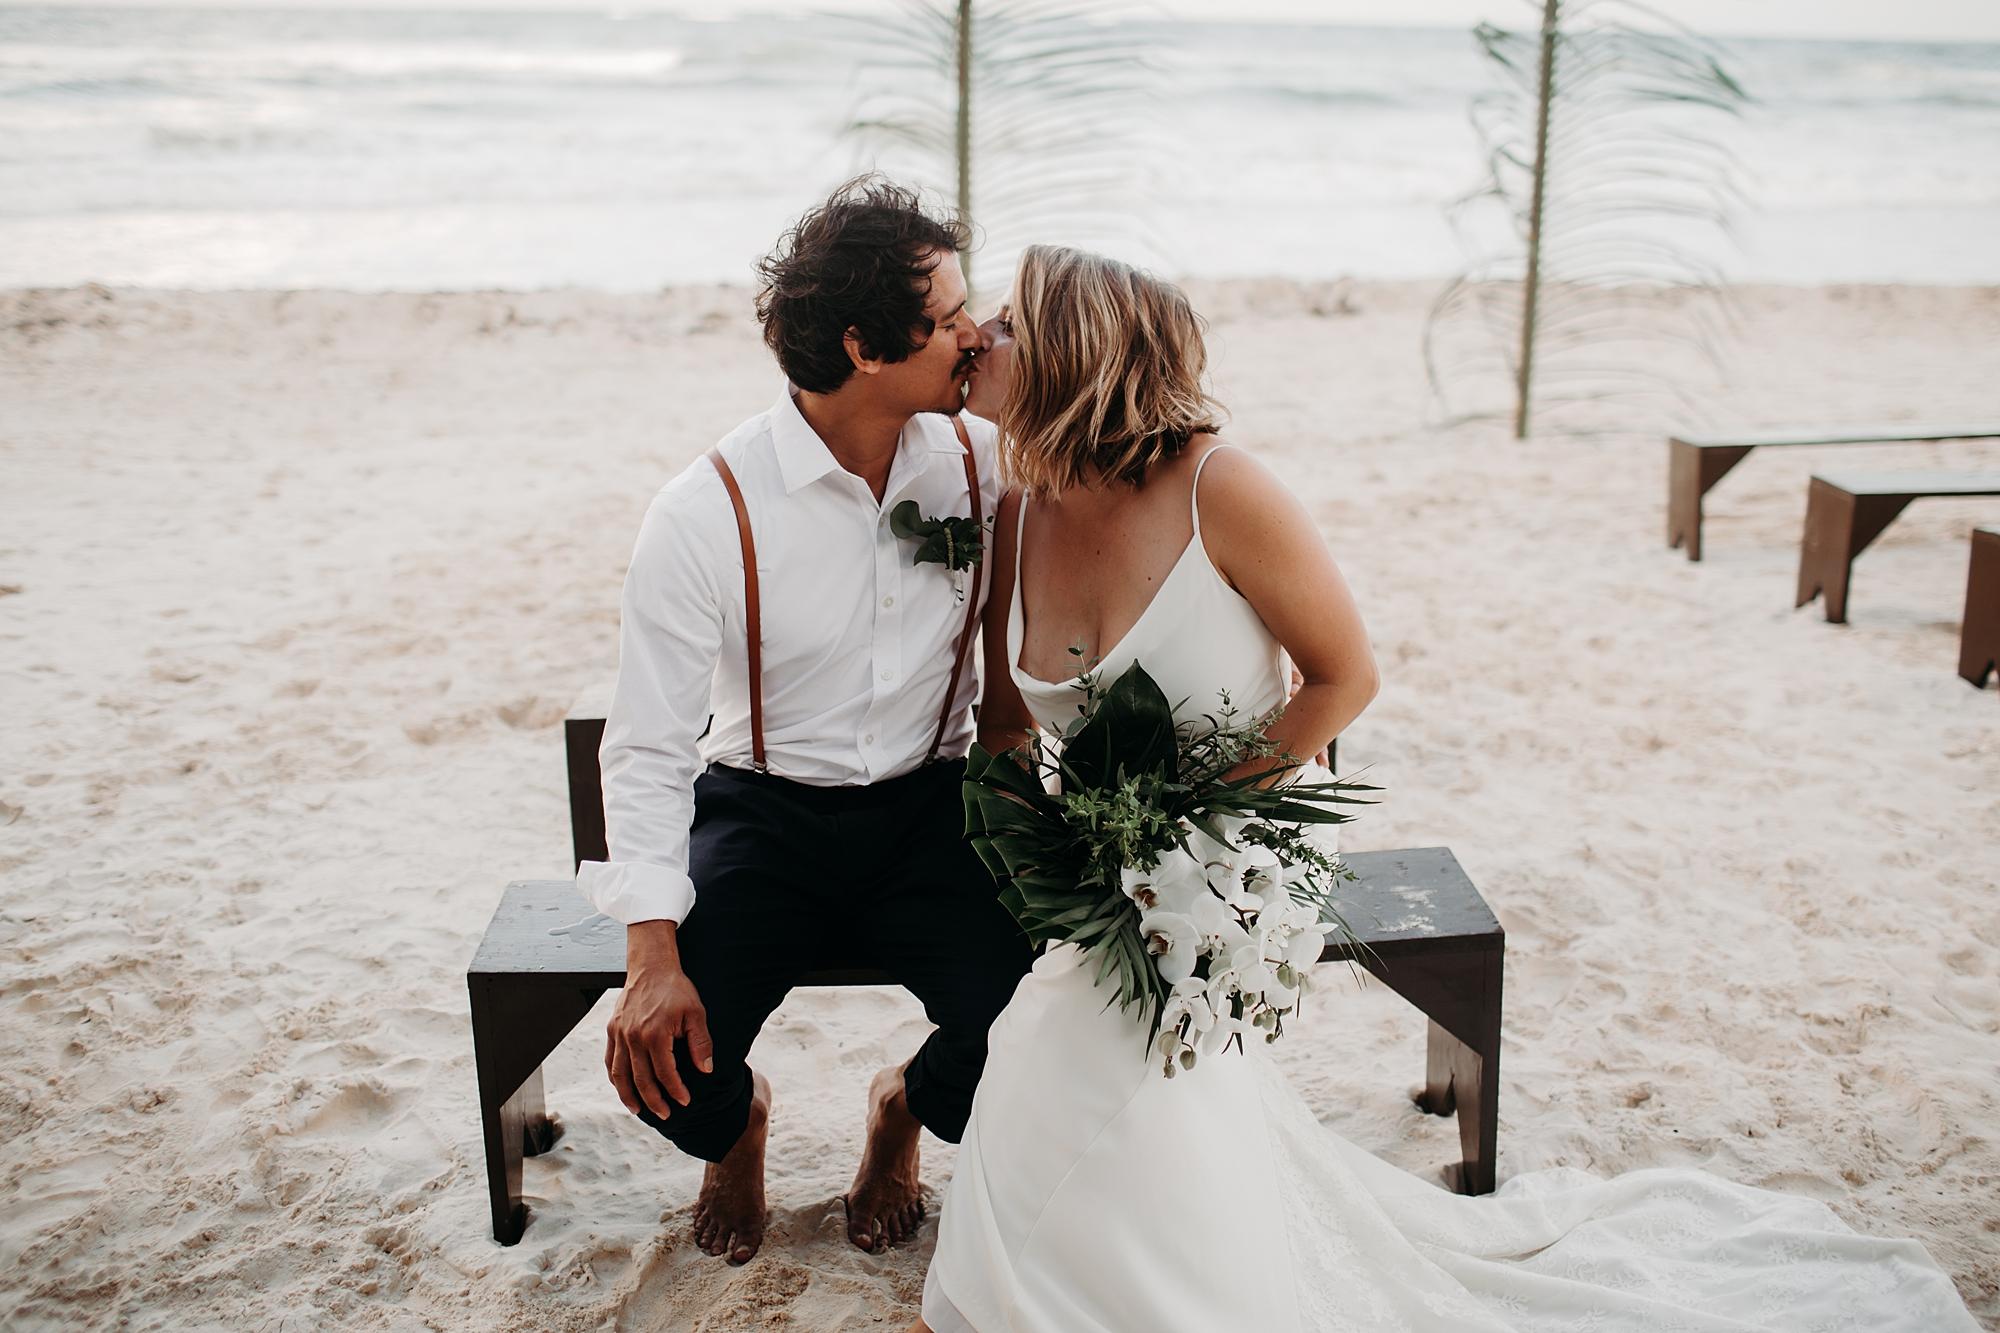 Danielle-San-Antonio-Wedding-Photographer-232_WEB.jpg